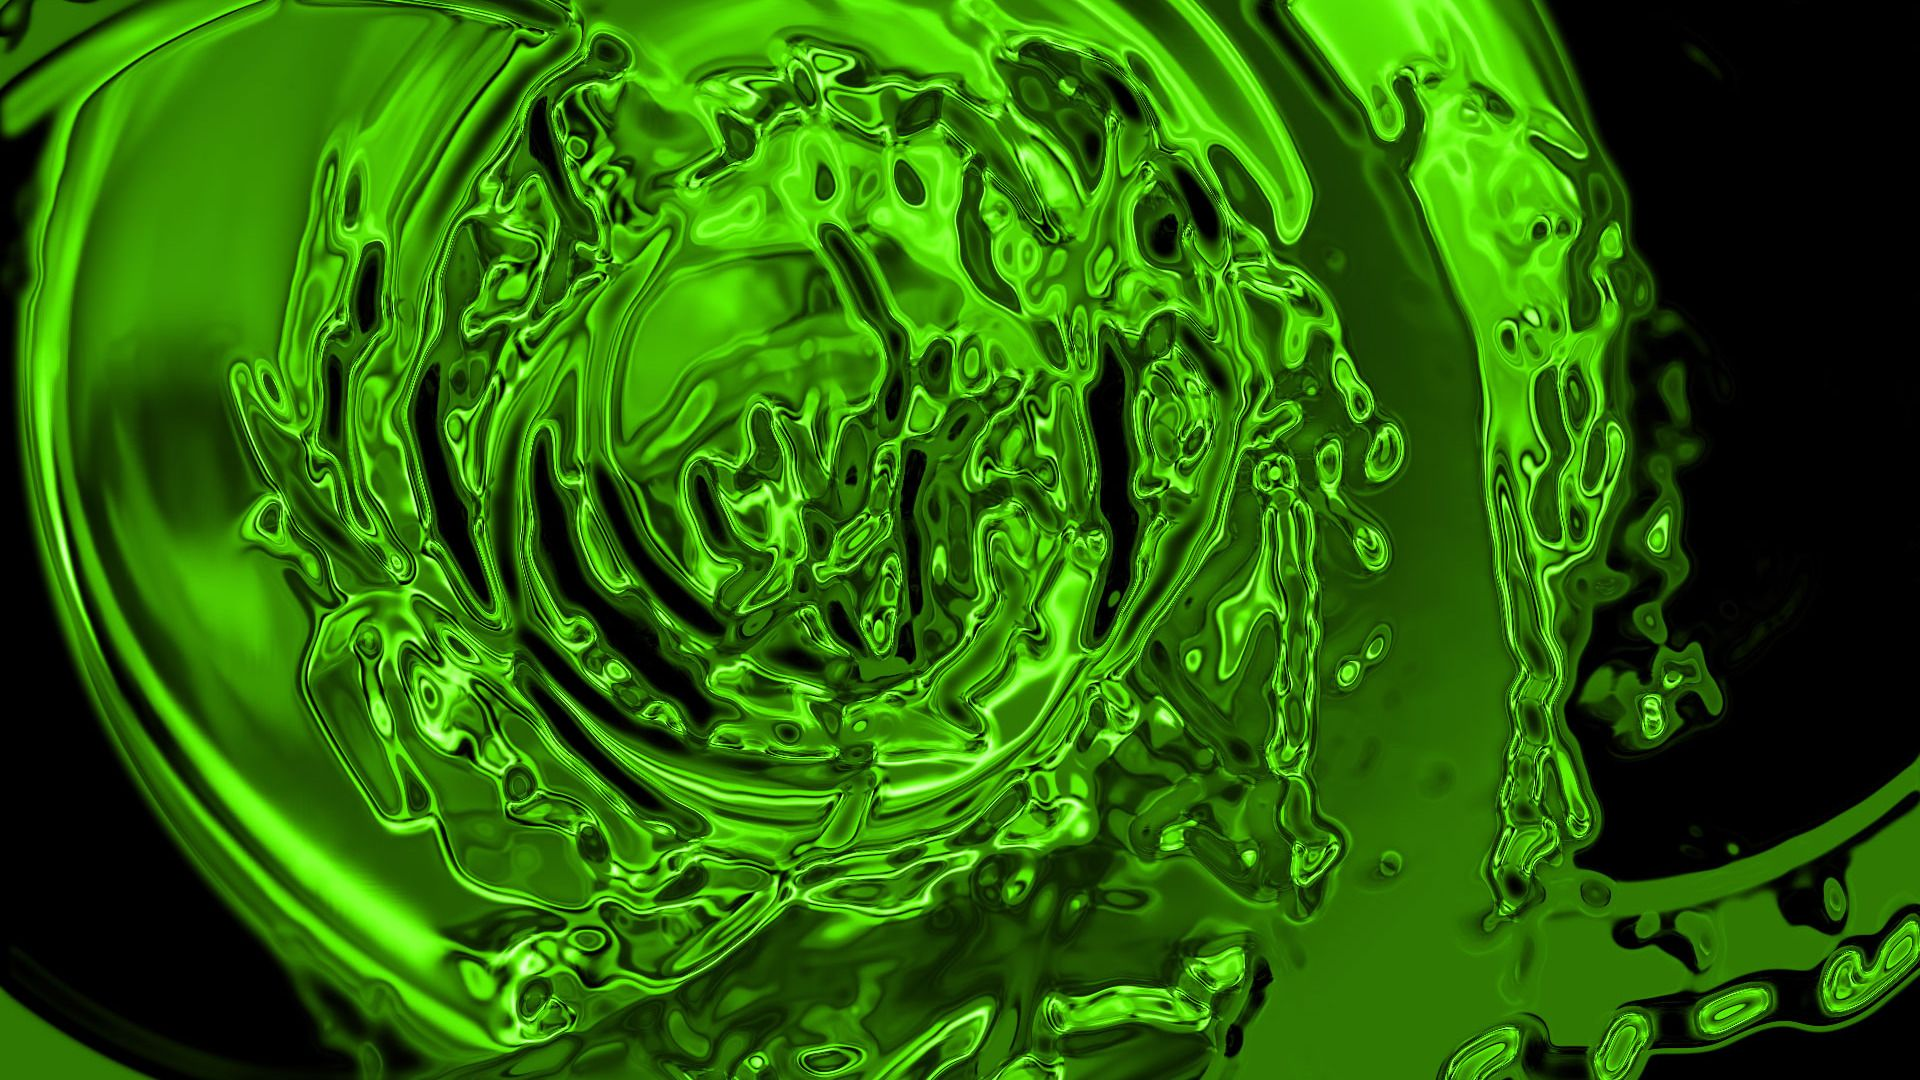 Neon Green free hd wallpaper